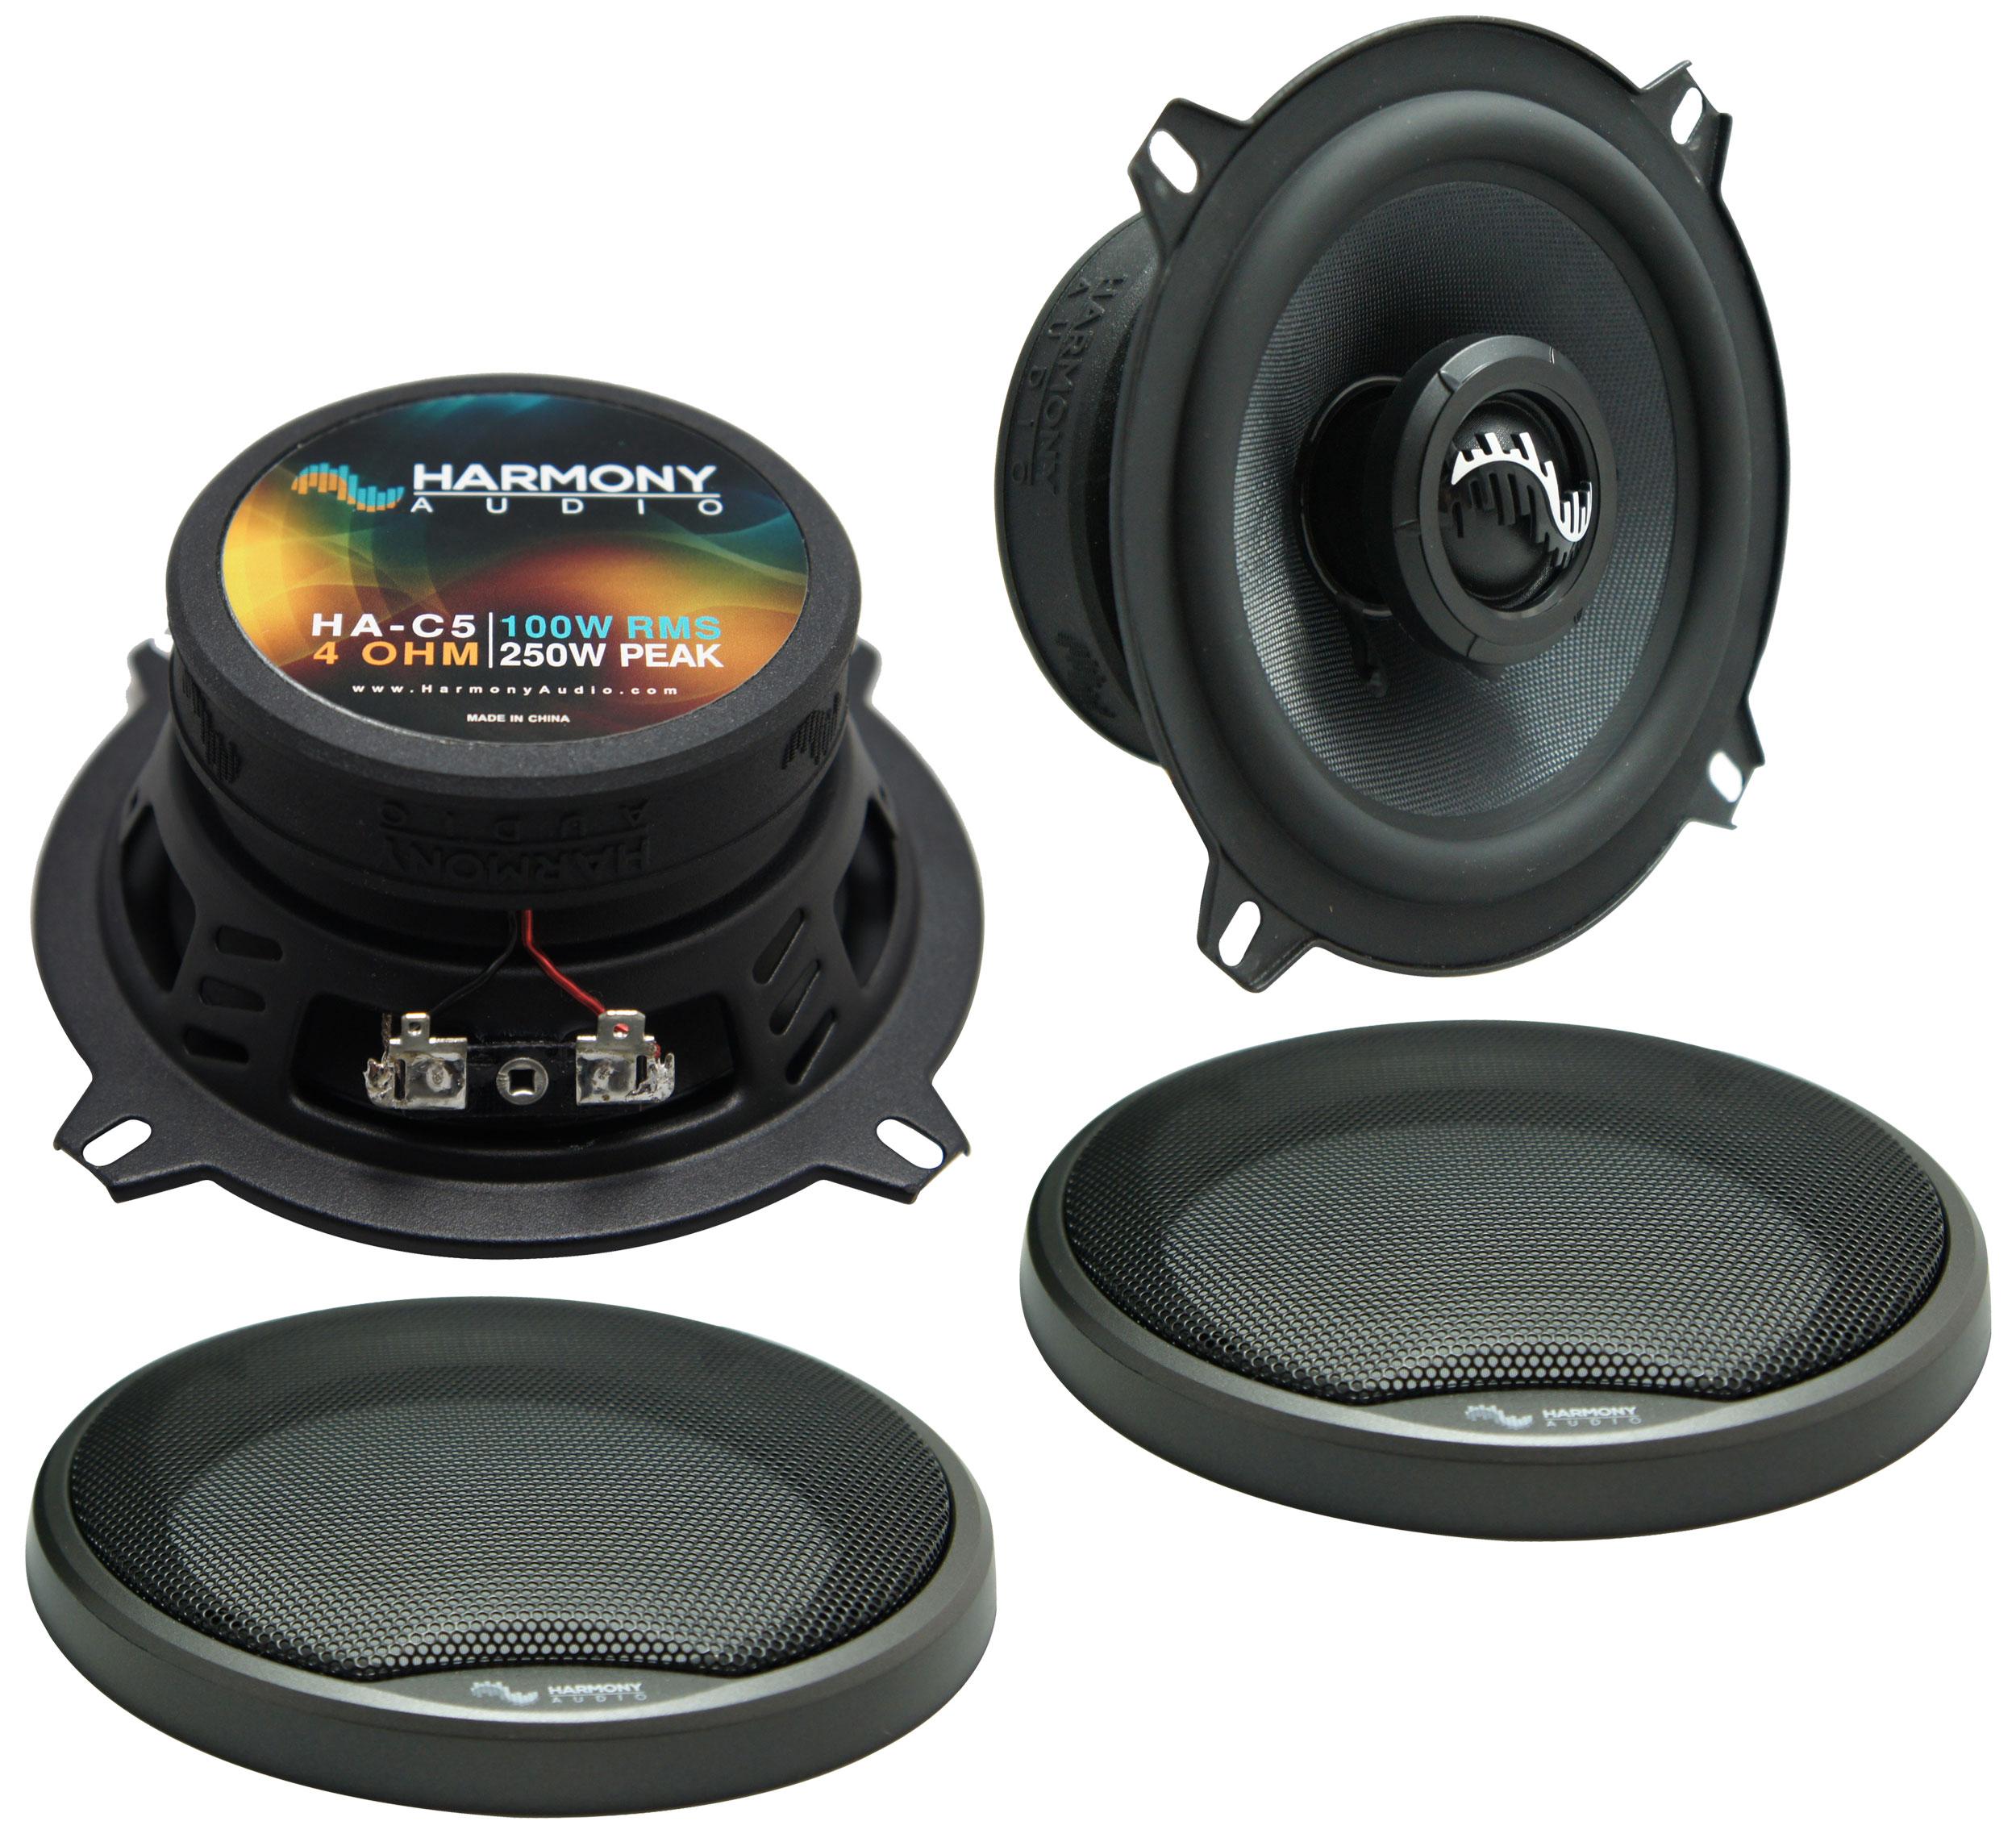 Fits Chevy Silverado 2500HD 2014 Rear Door Premium Speaker Replacement Harmony HA-C5 New